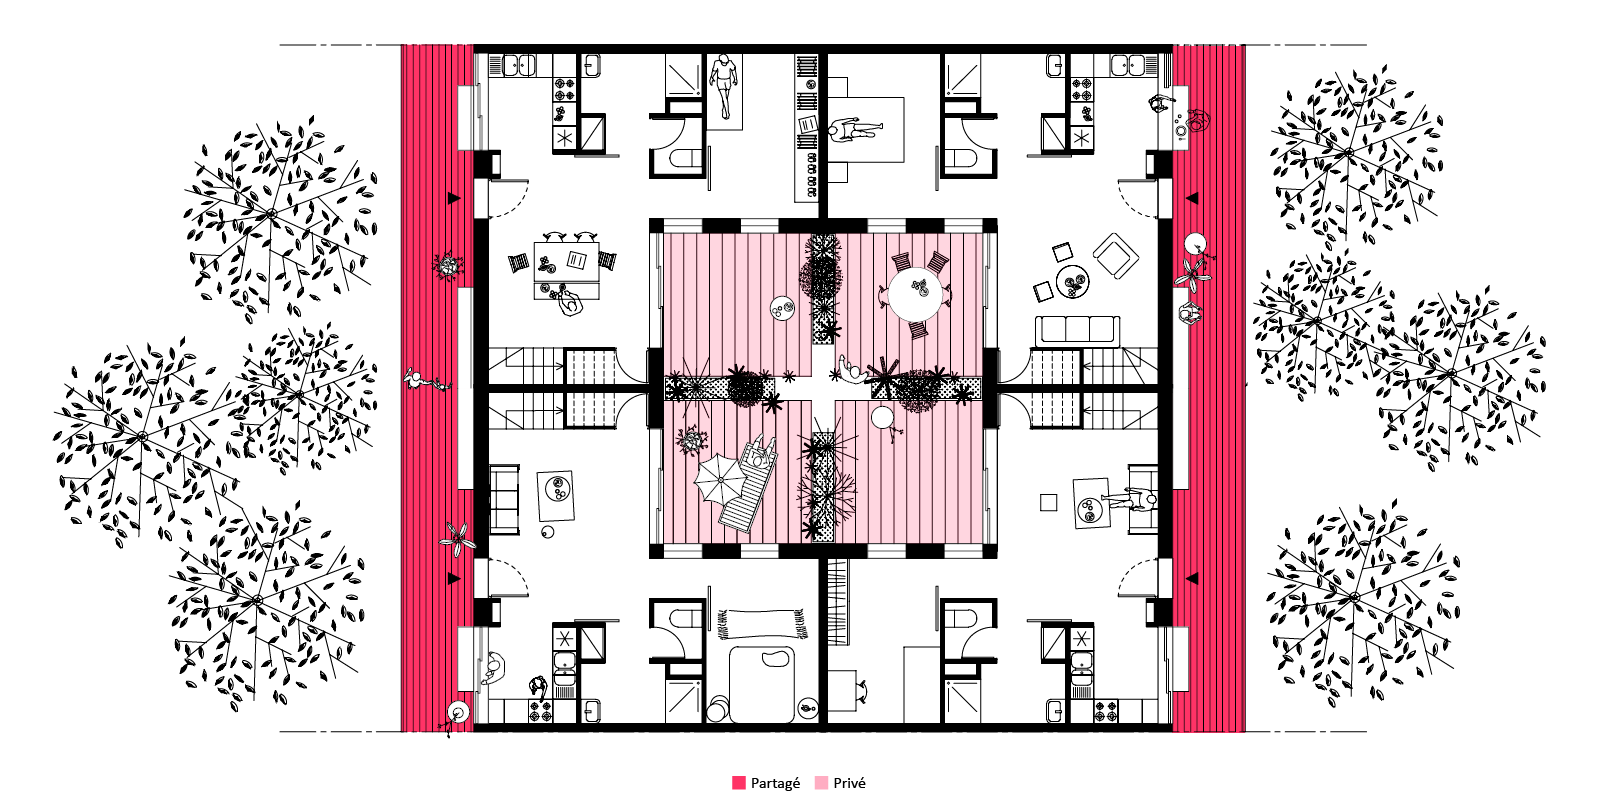 portfolio archive sophie delhay architecte. Black Bedroom Furniture Sets. Home Design Ideas